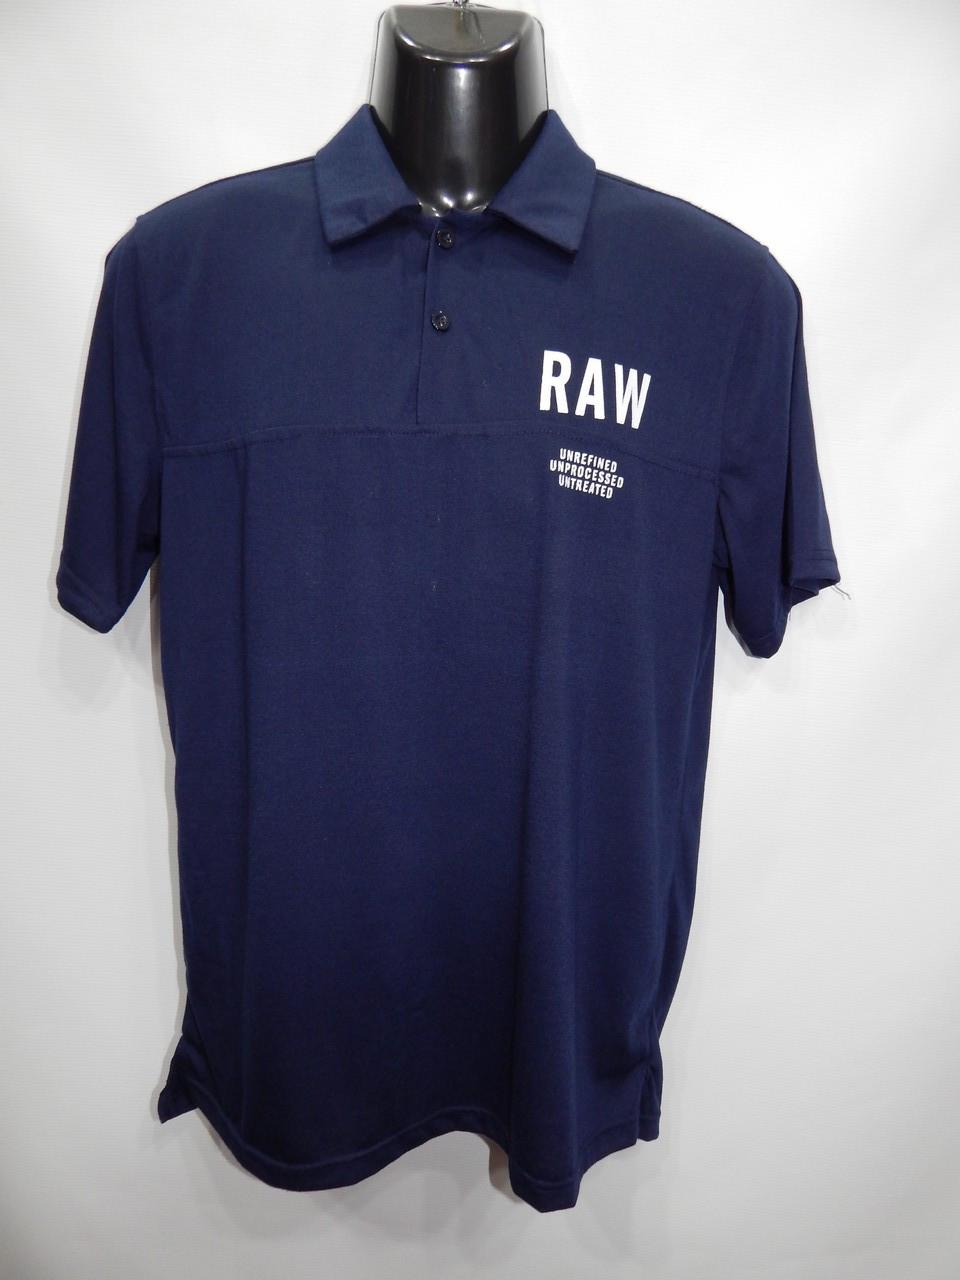 Мужская футболка поло Holdwell  р.50 331мф